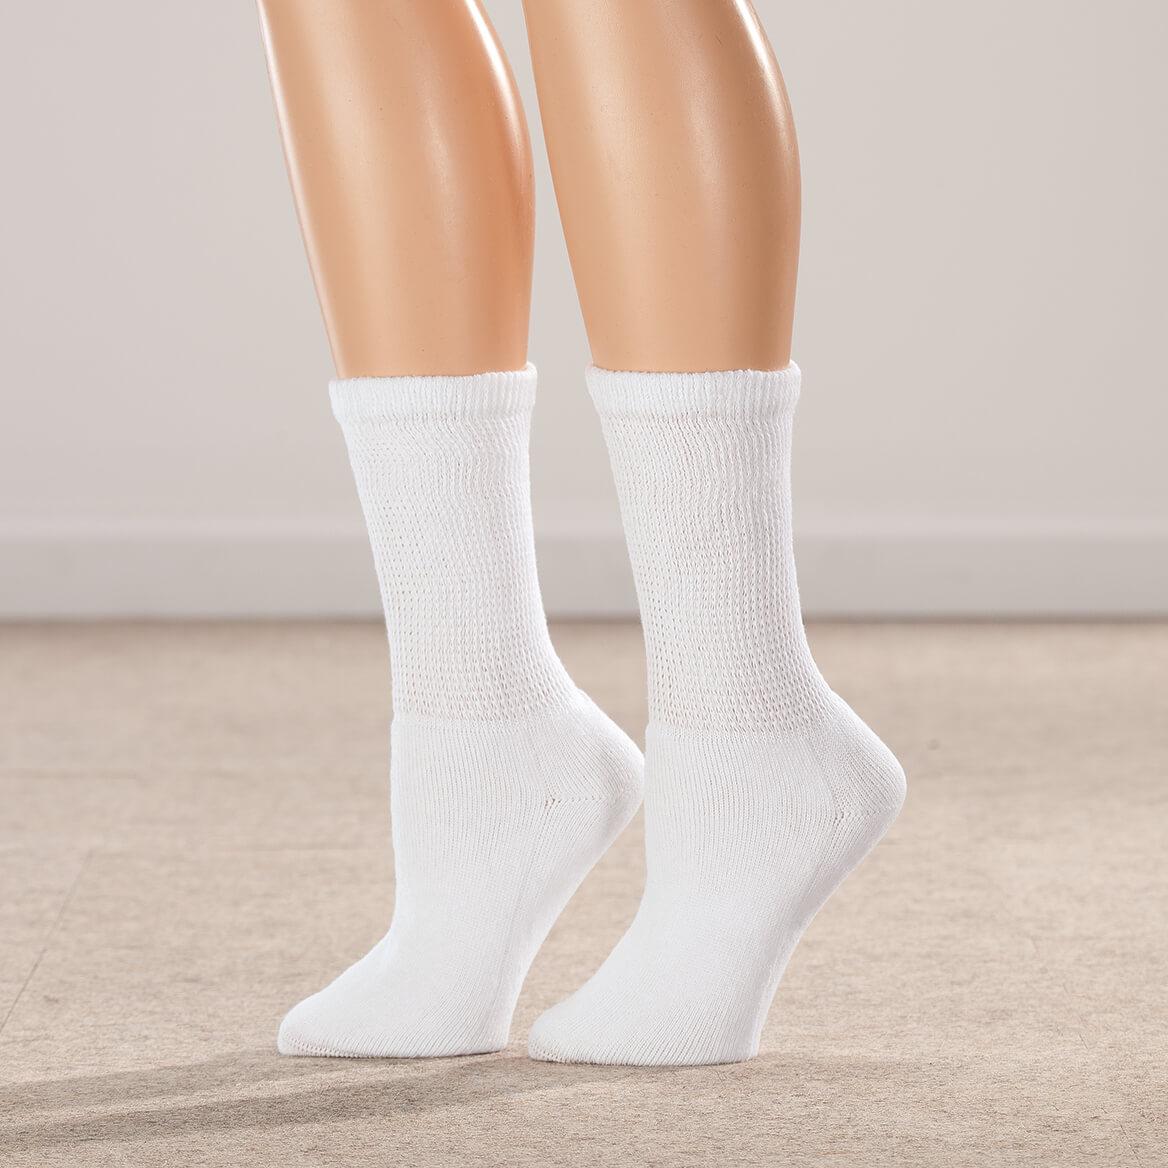 38ea232b3fe447 ... Silver Steps™ 3 Pack 1/4 Cut Cool + Dry Diabetic Socks-358708